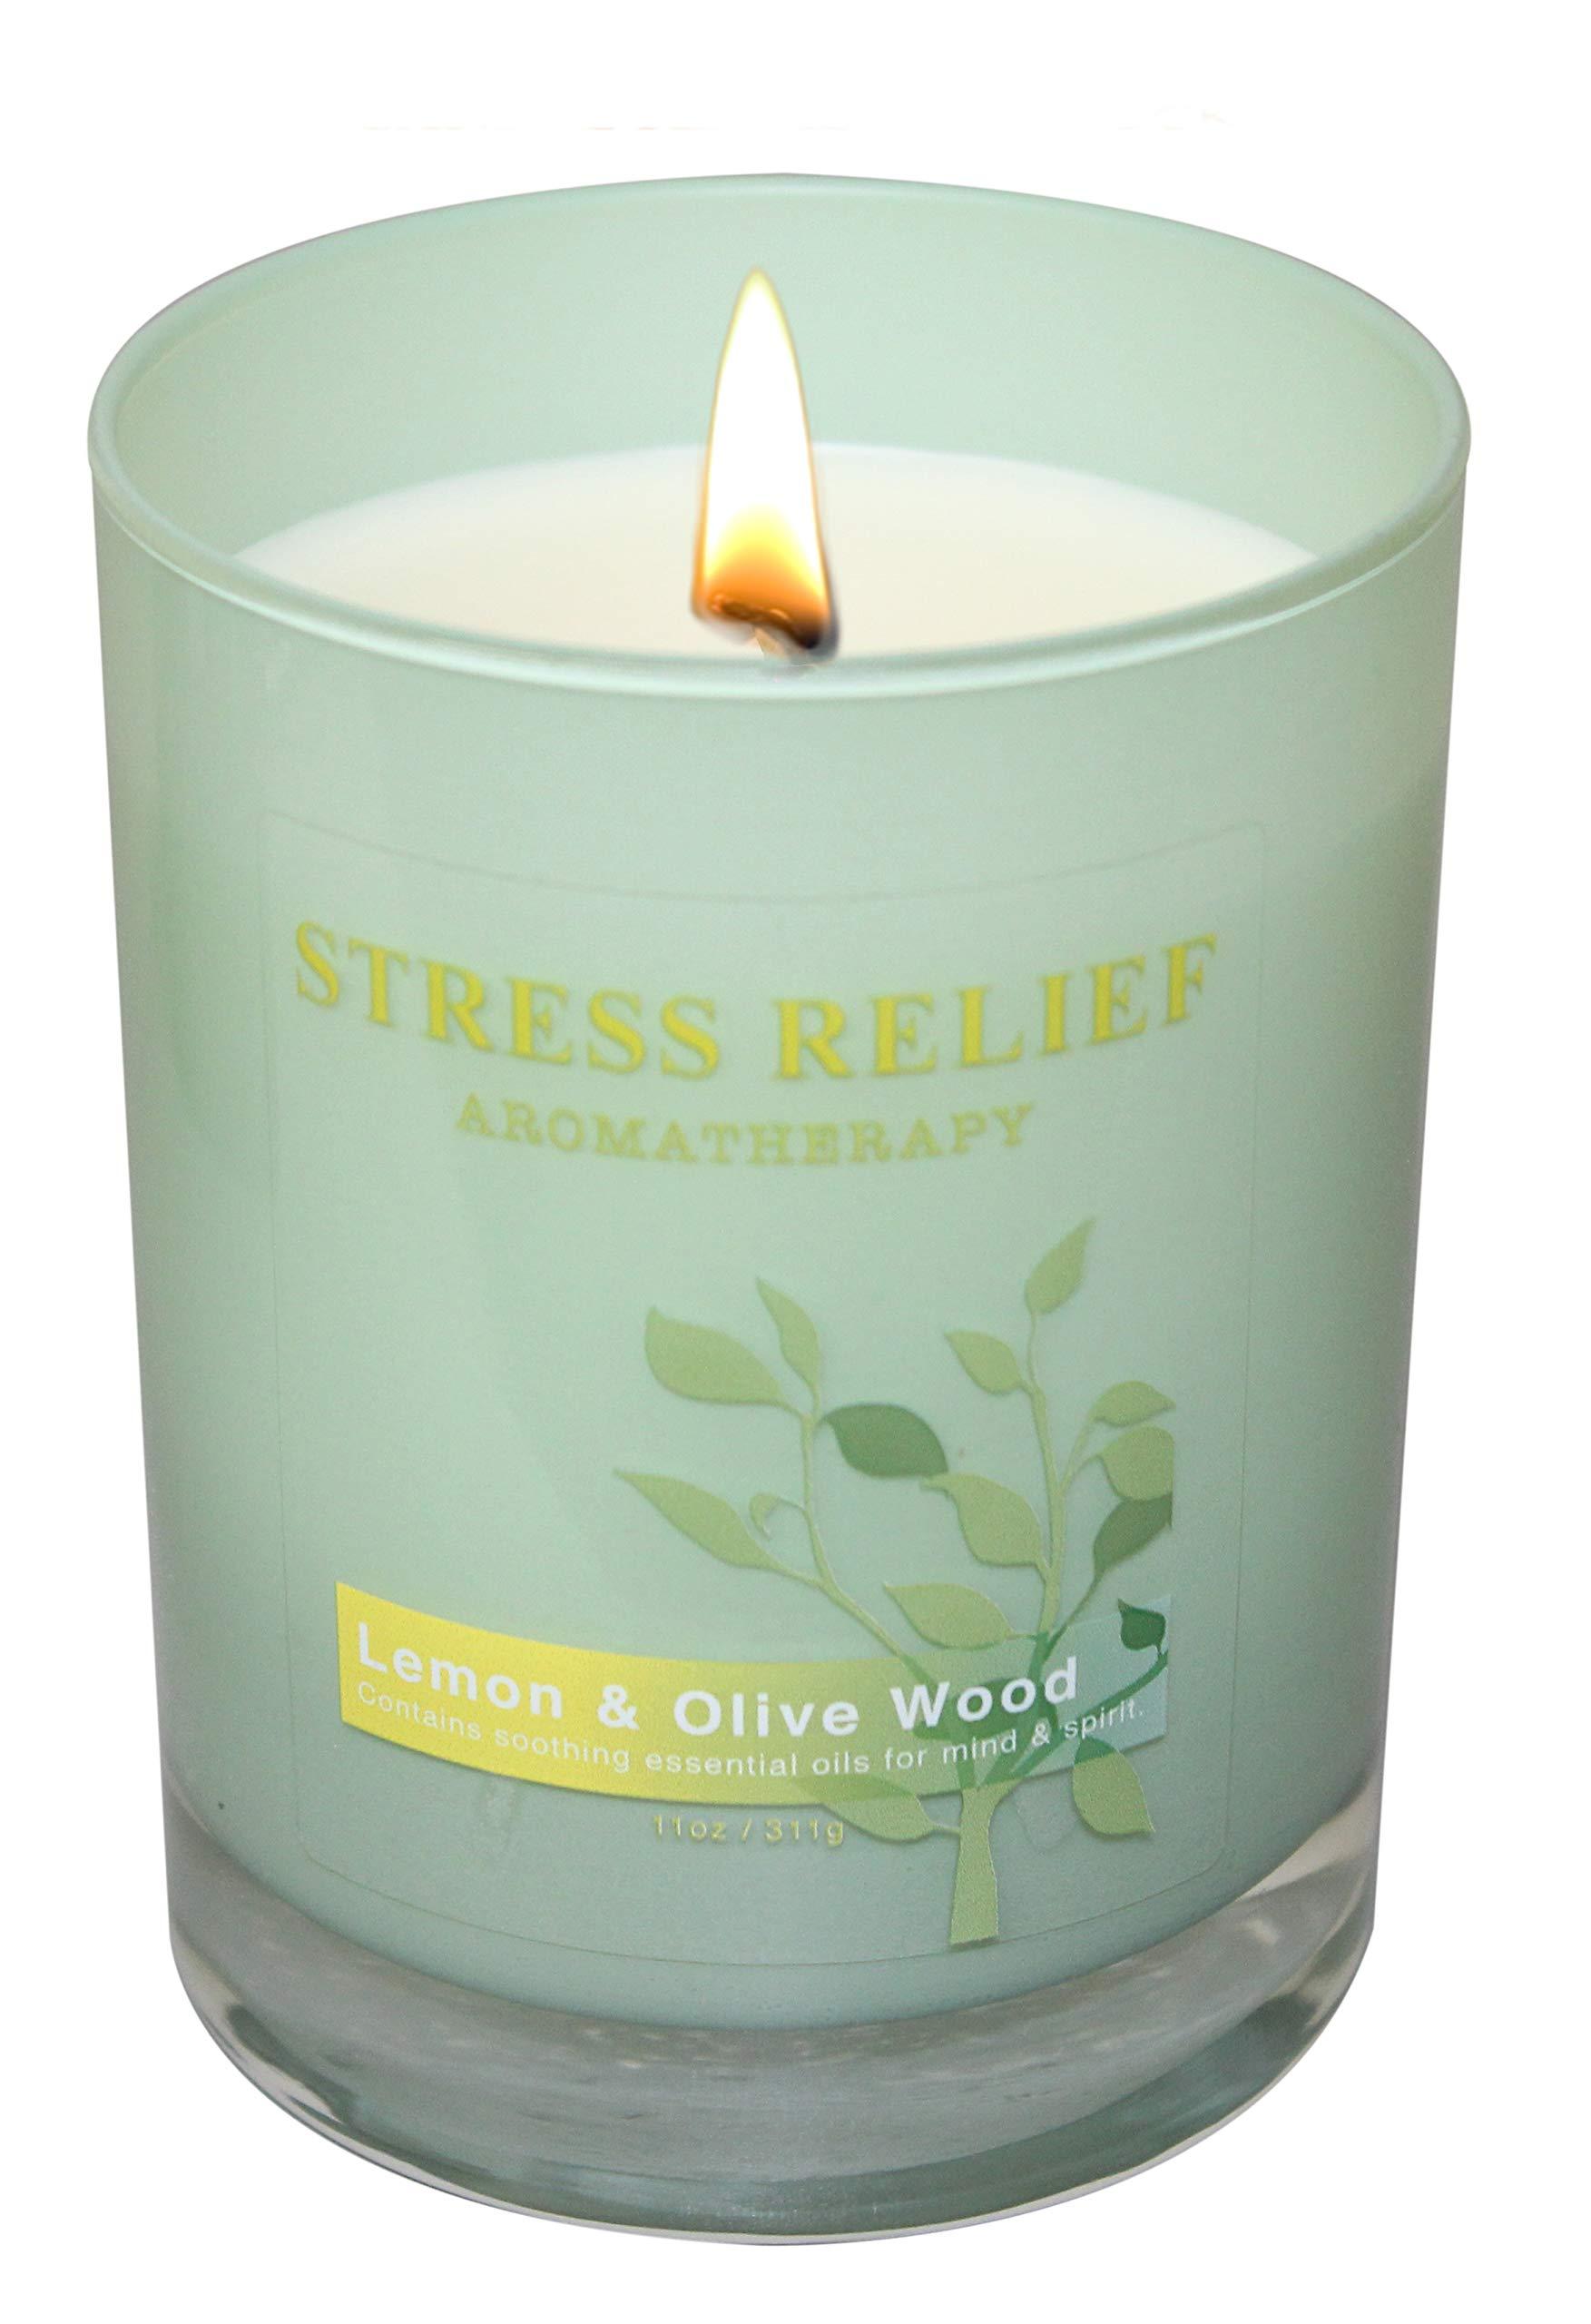 Scentsational Stress Relief (Lemon & Olive Wood)